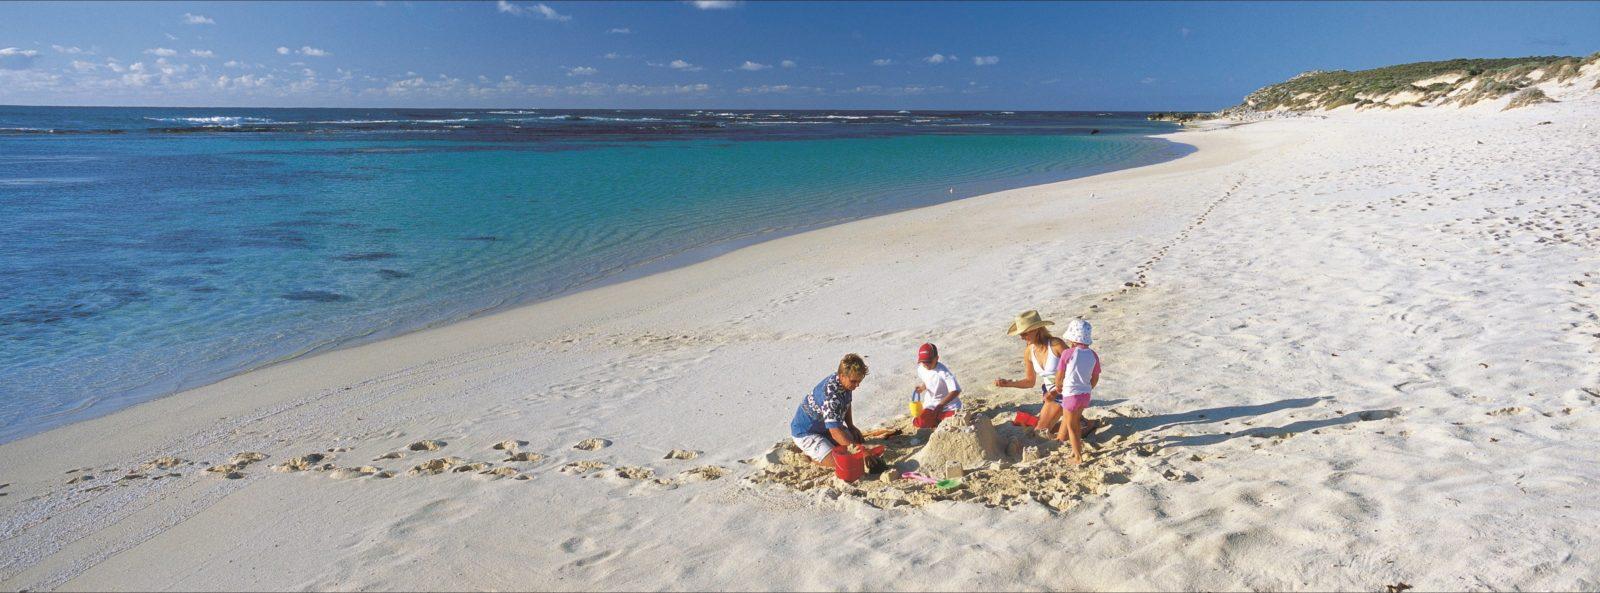 Ricey Beach, Rottnest Island, Western Australia